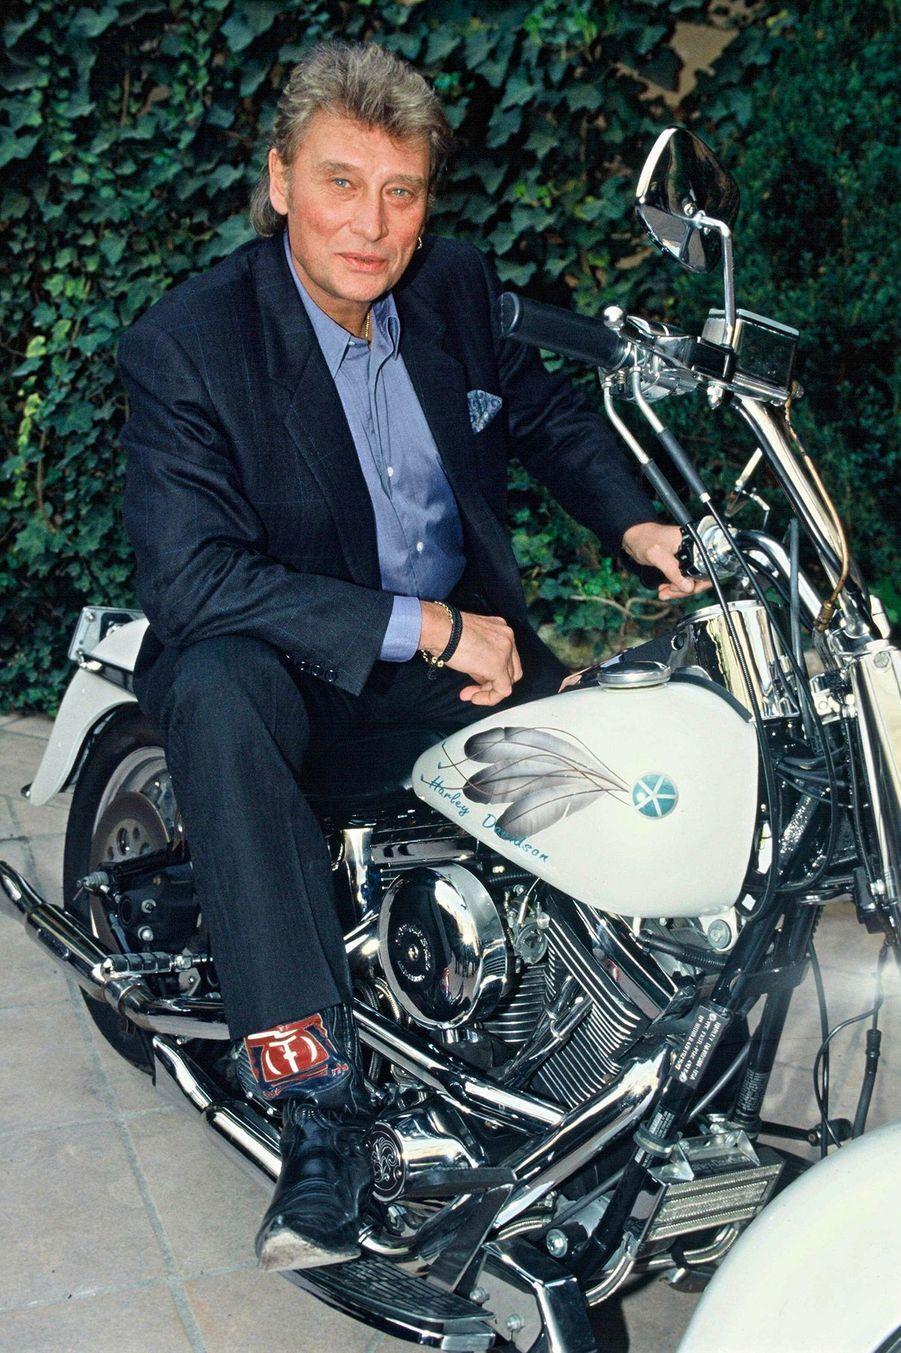 Johnny Hallyday posant sur une Harley Davidson en 1992.